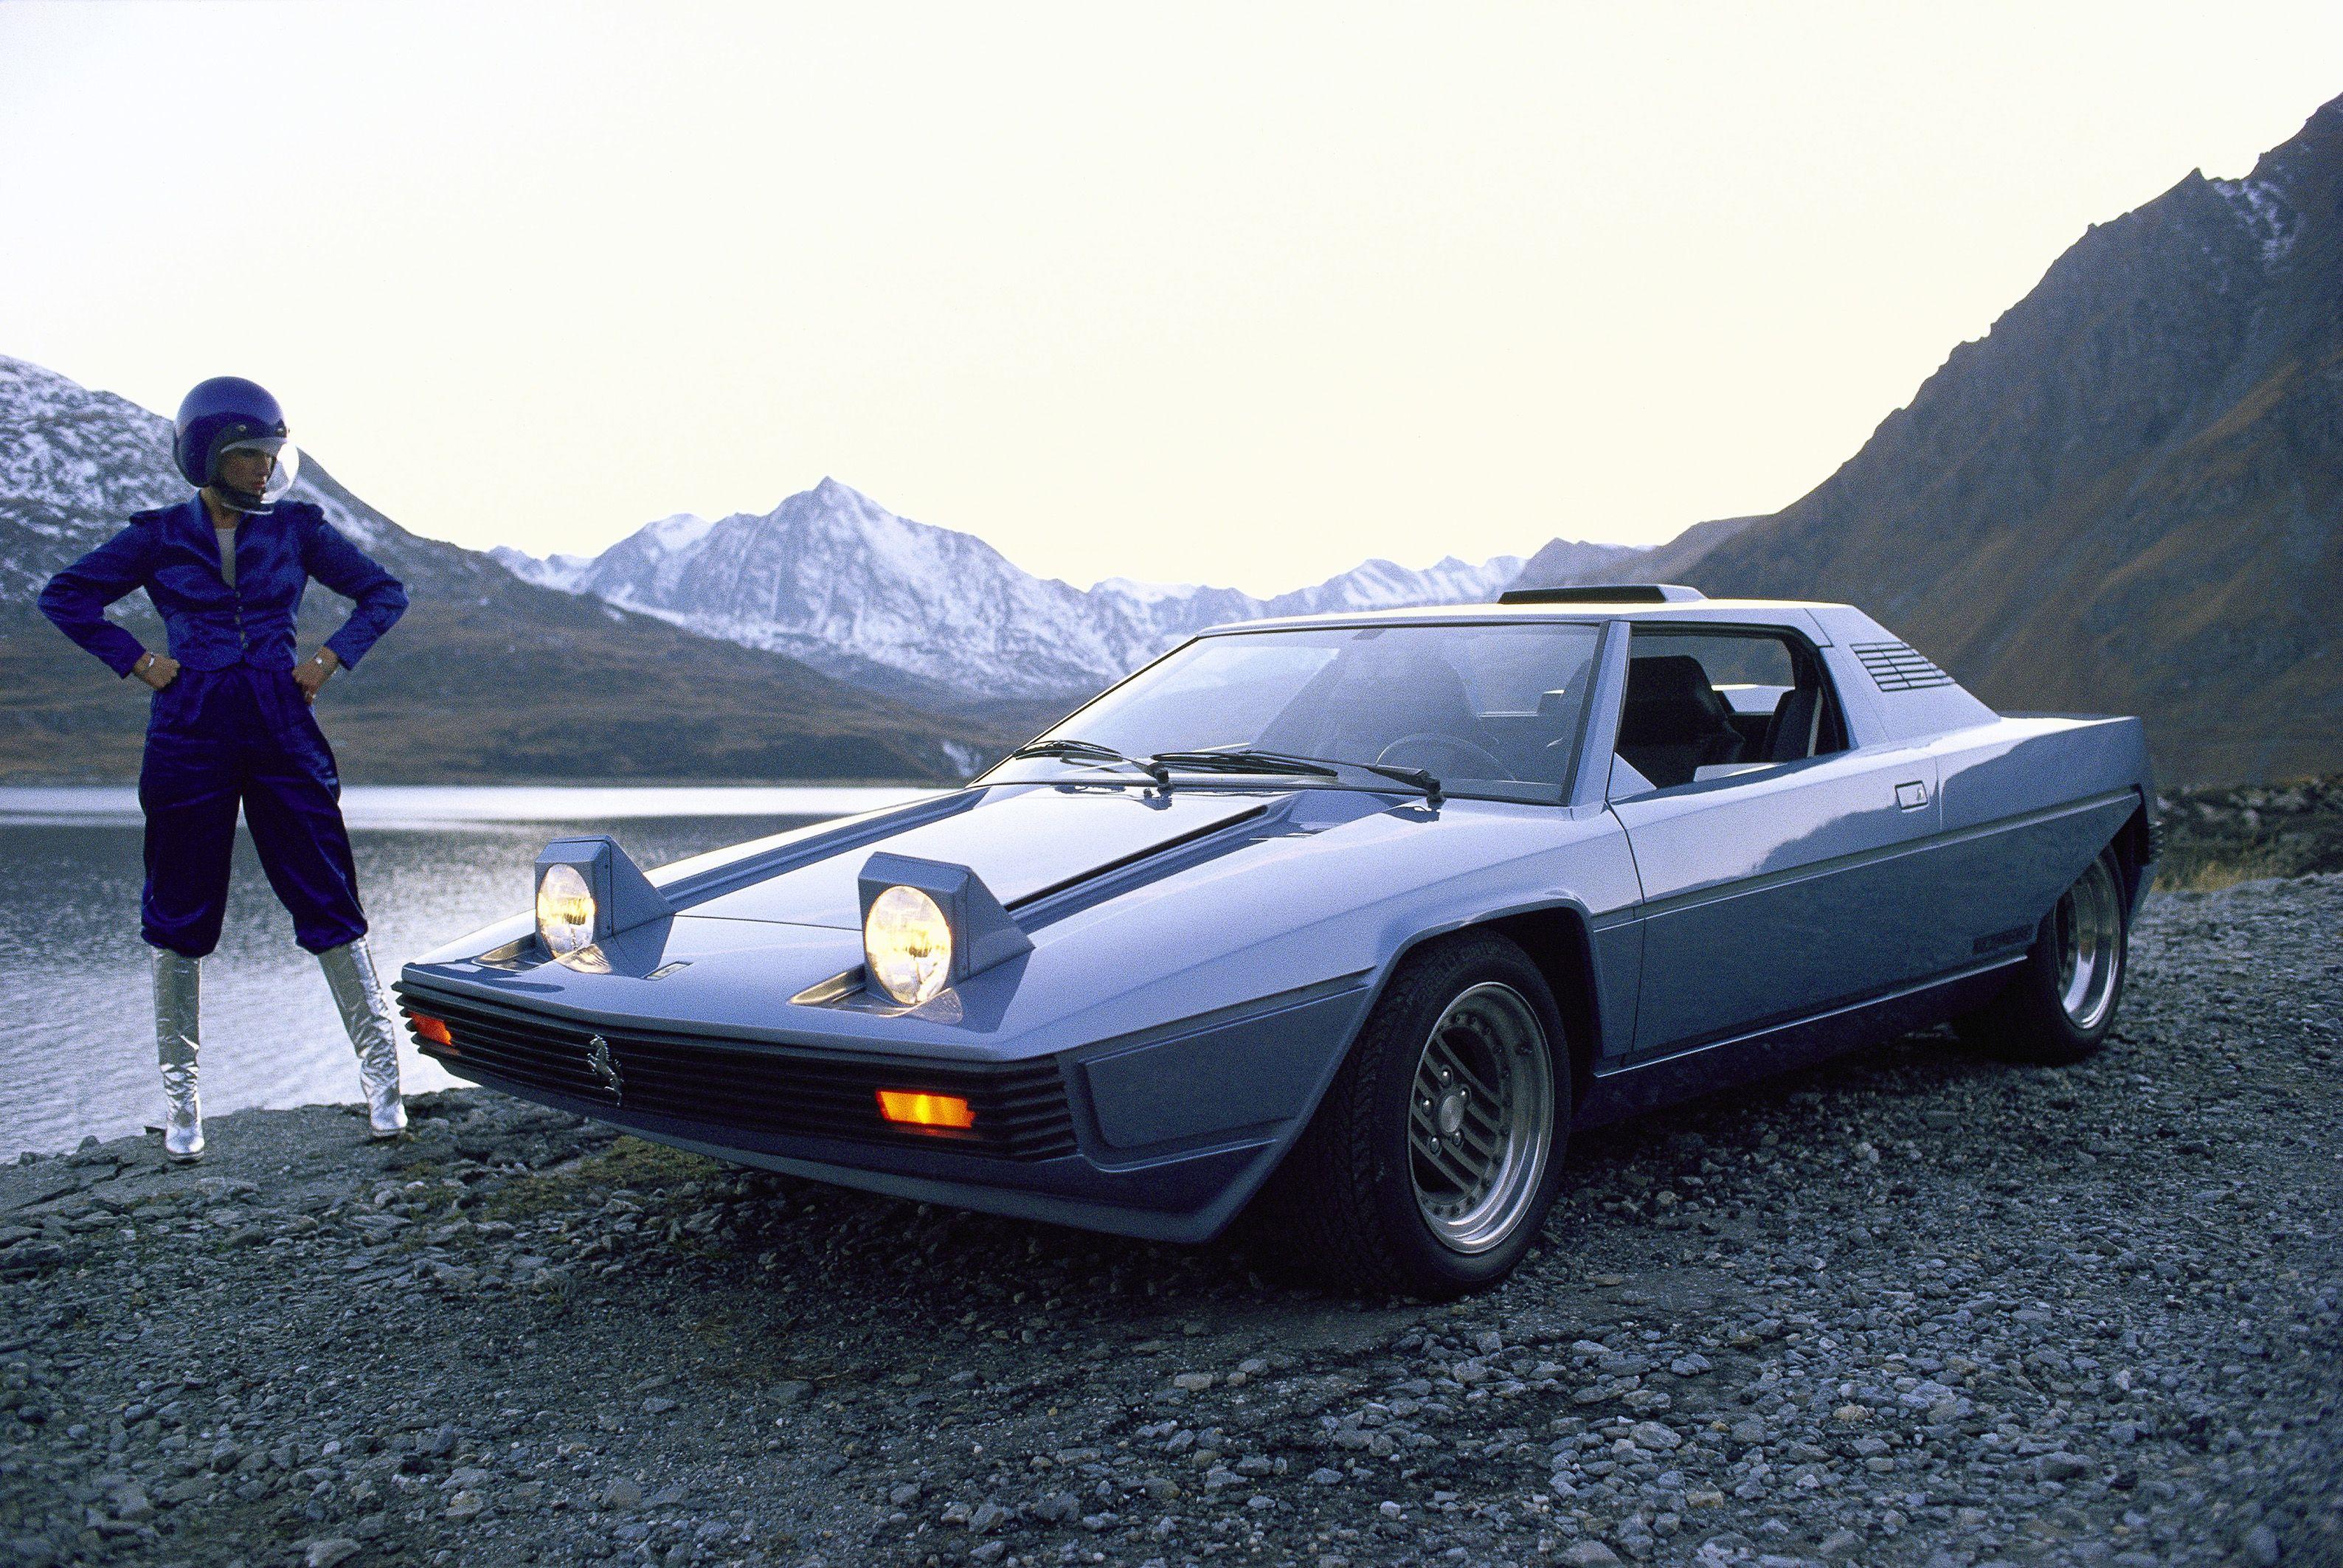 80S JAPANESE SPORTS CARS image galleries - imageKB.com | Retro саr